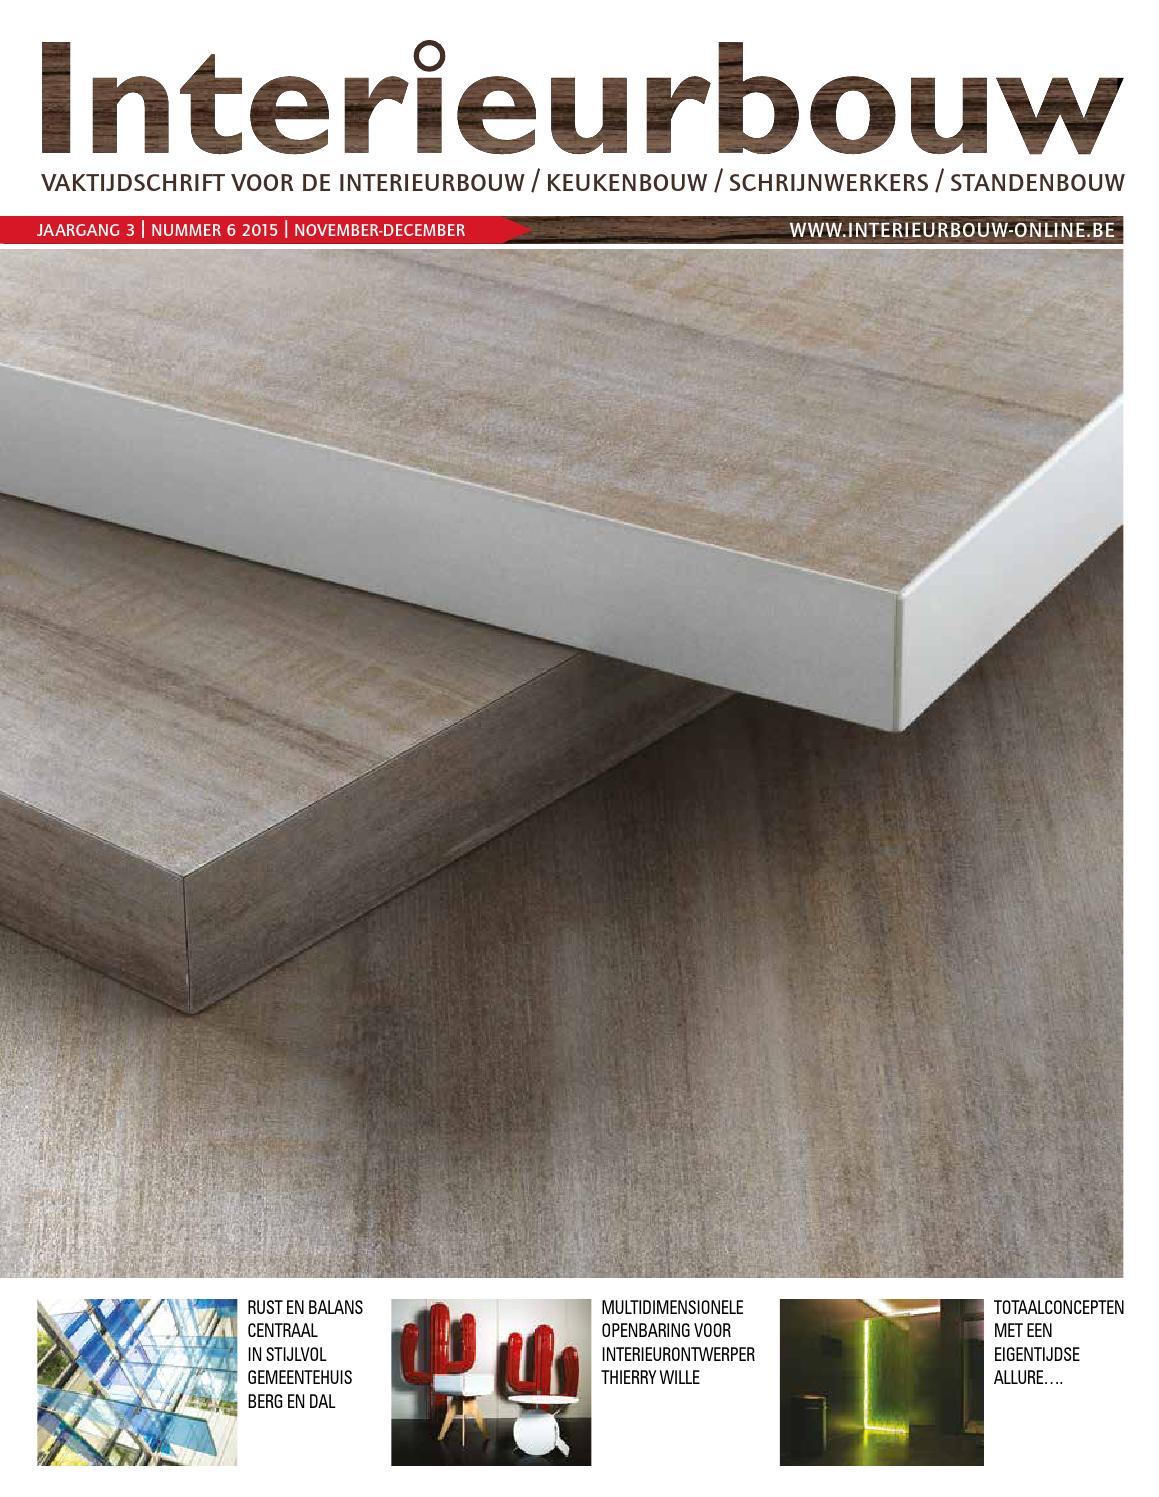 Binnenwerk 06 2015 by Louwers Uitgeversorganisatie BV - issuu